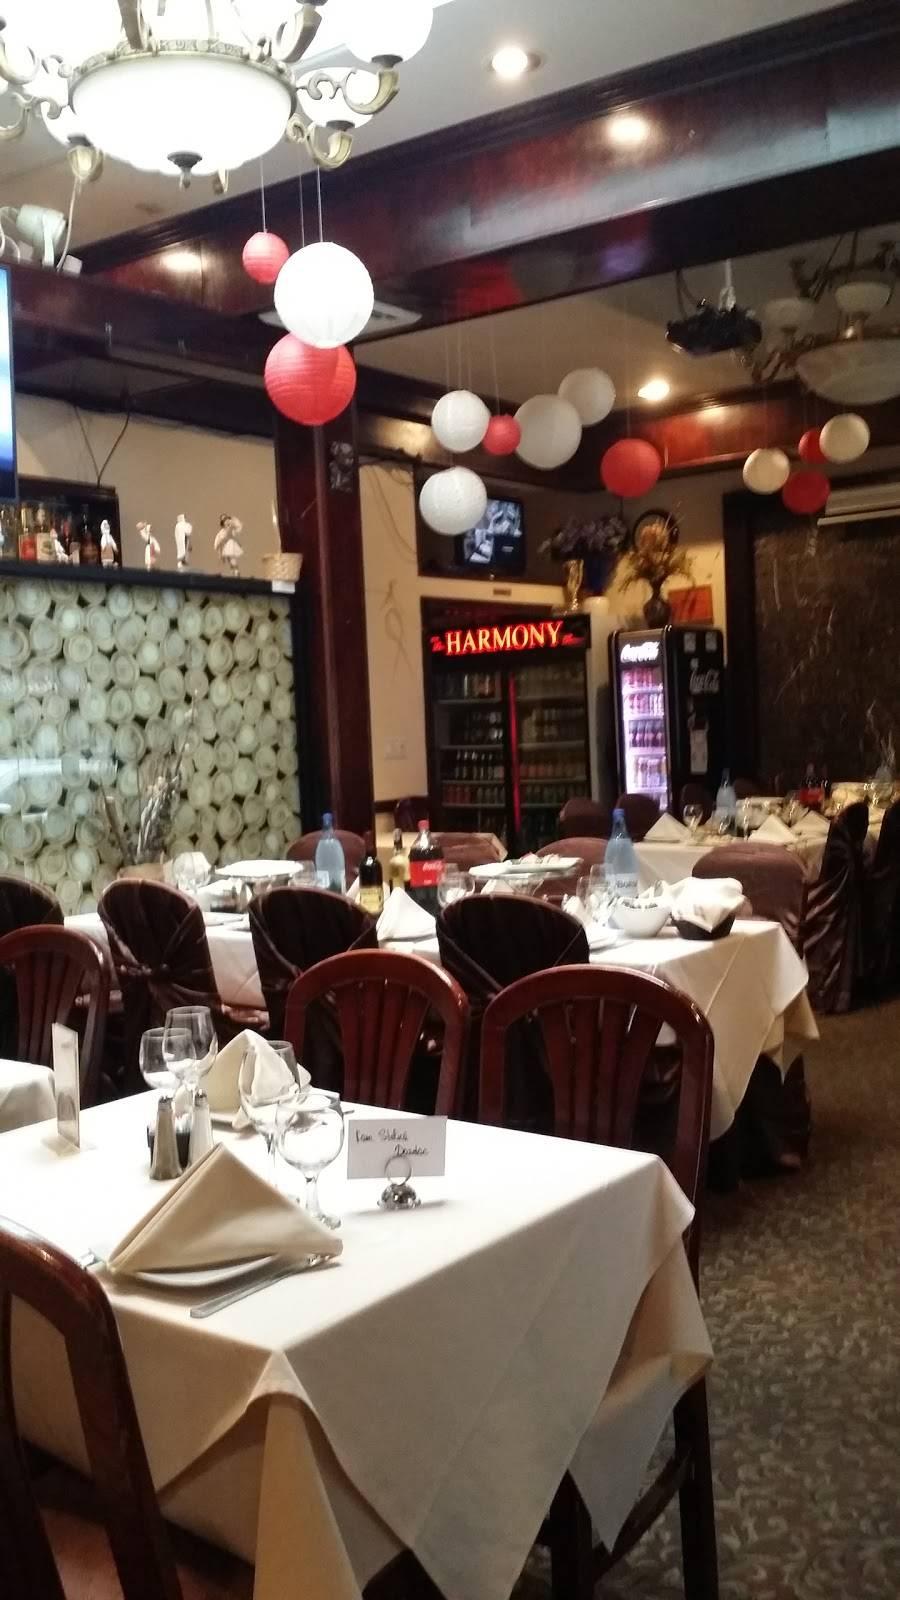 Harmony Terrace | restaurant | 4757 41st St, Sunnyside, NY 11104, USA | 7187844651 OR +1 718-784-4651